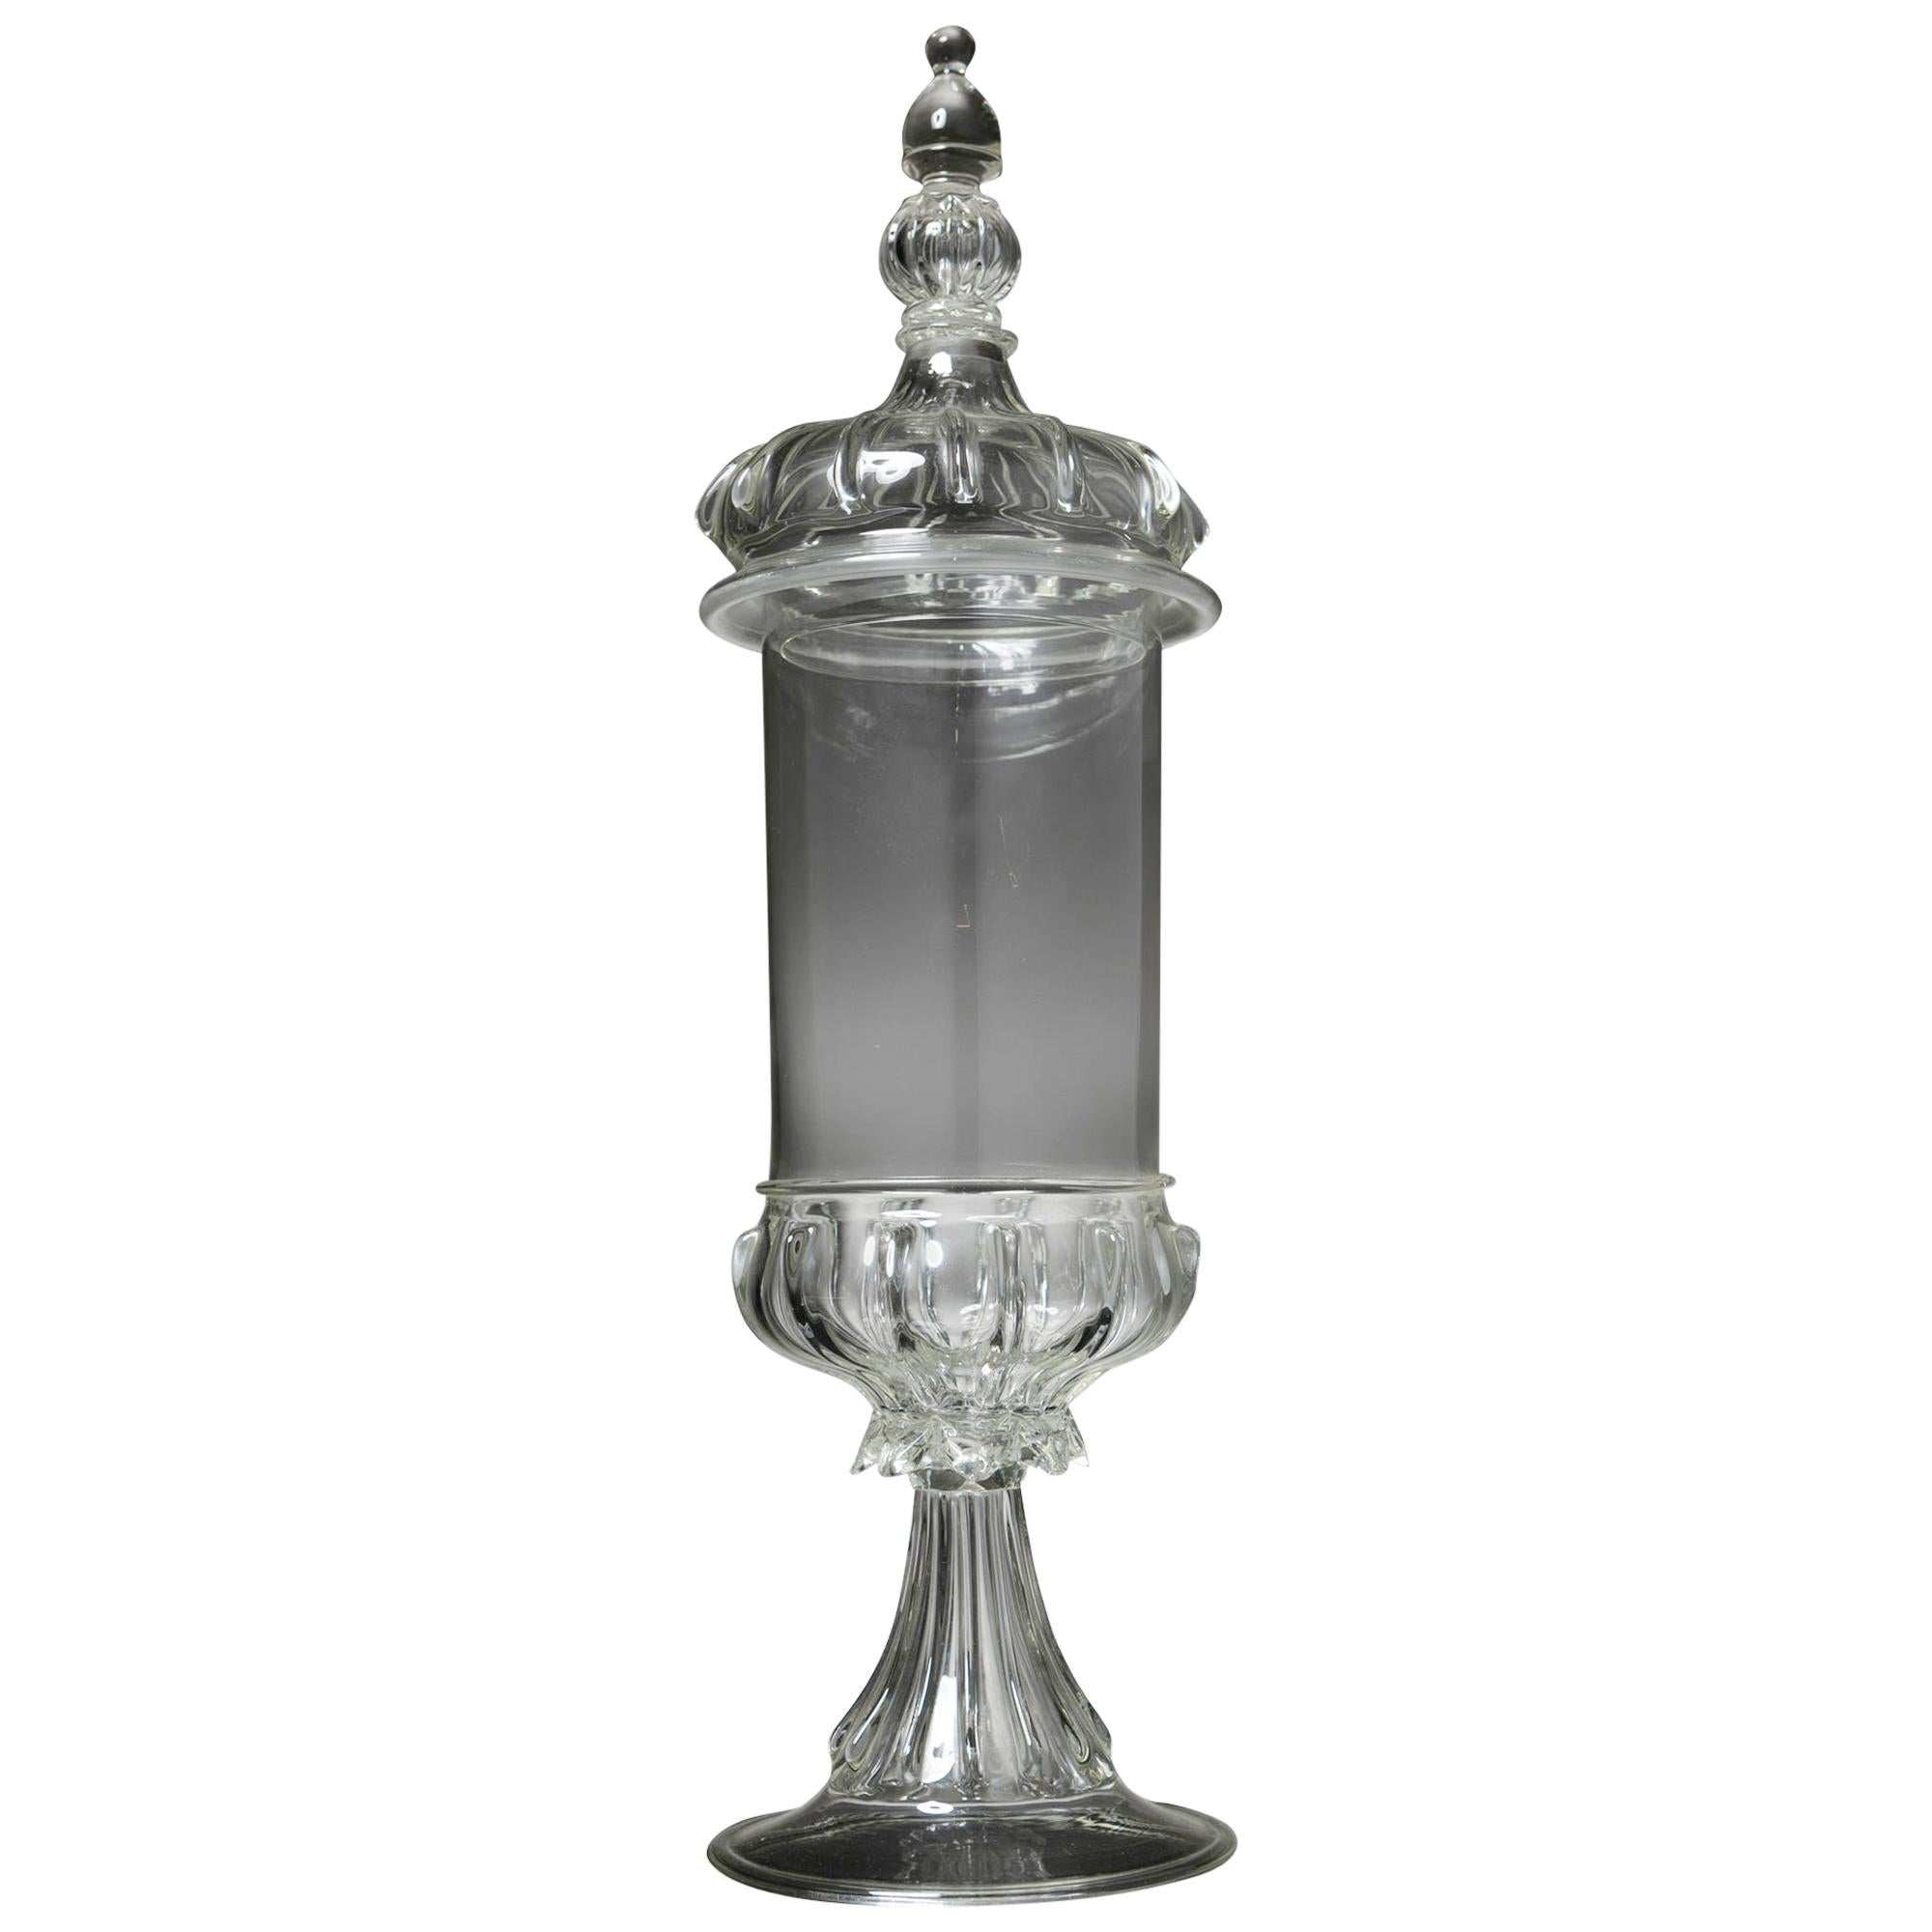 Murano Glass Jar Attributed to Vetreria Vistosi